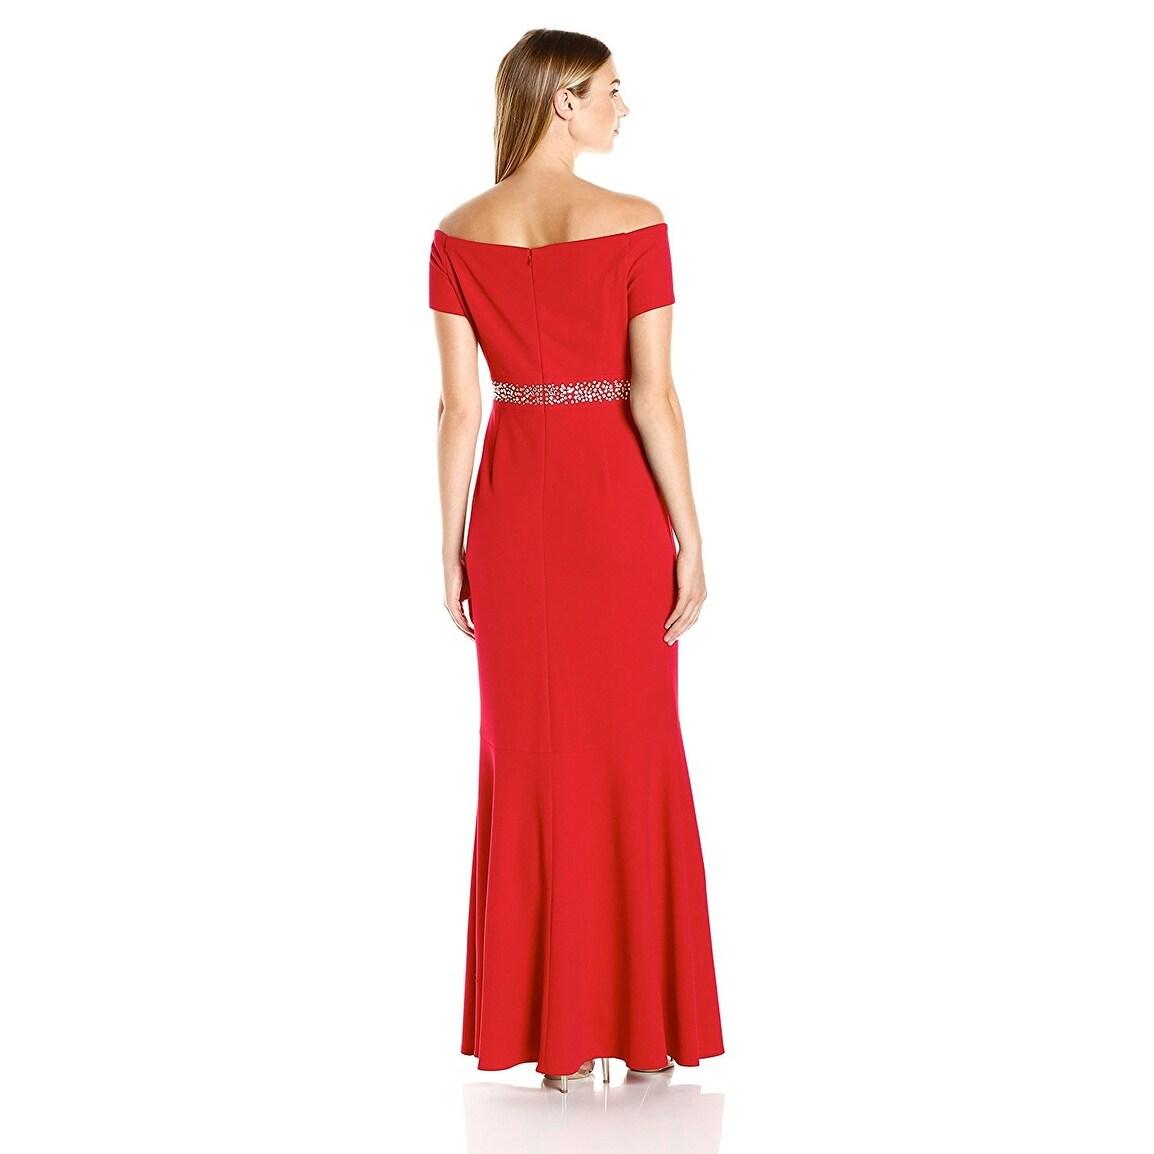 Shop Alex Evenings Off The Shoulder Embellished Mermaid Evening Gown ...